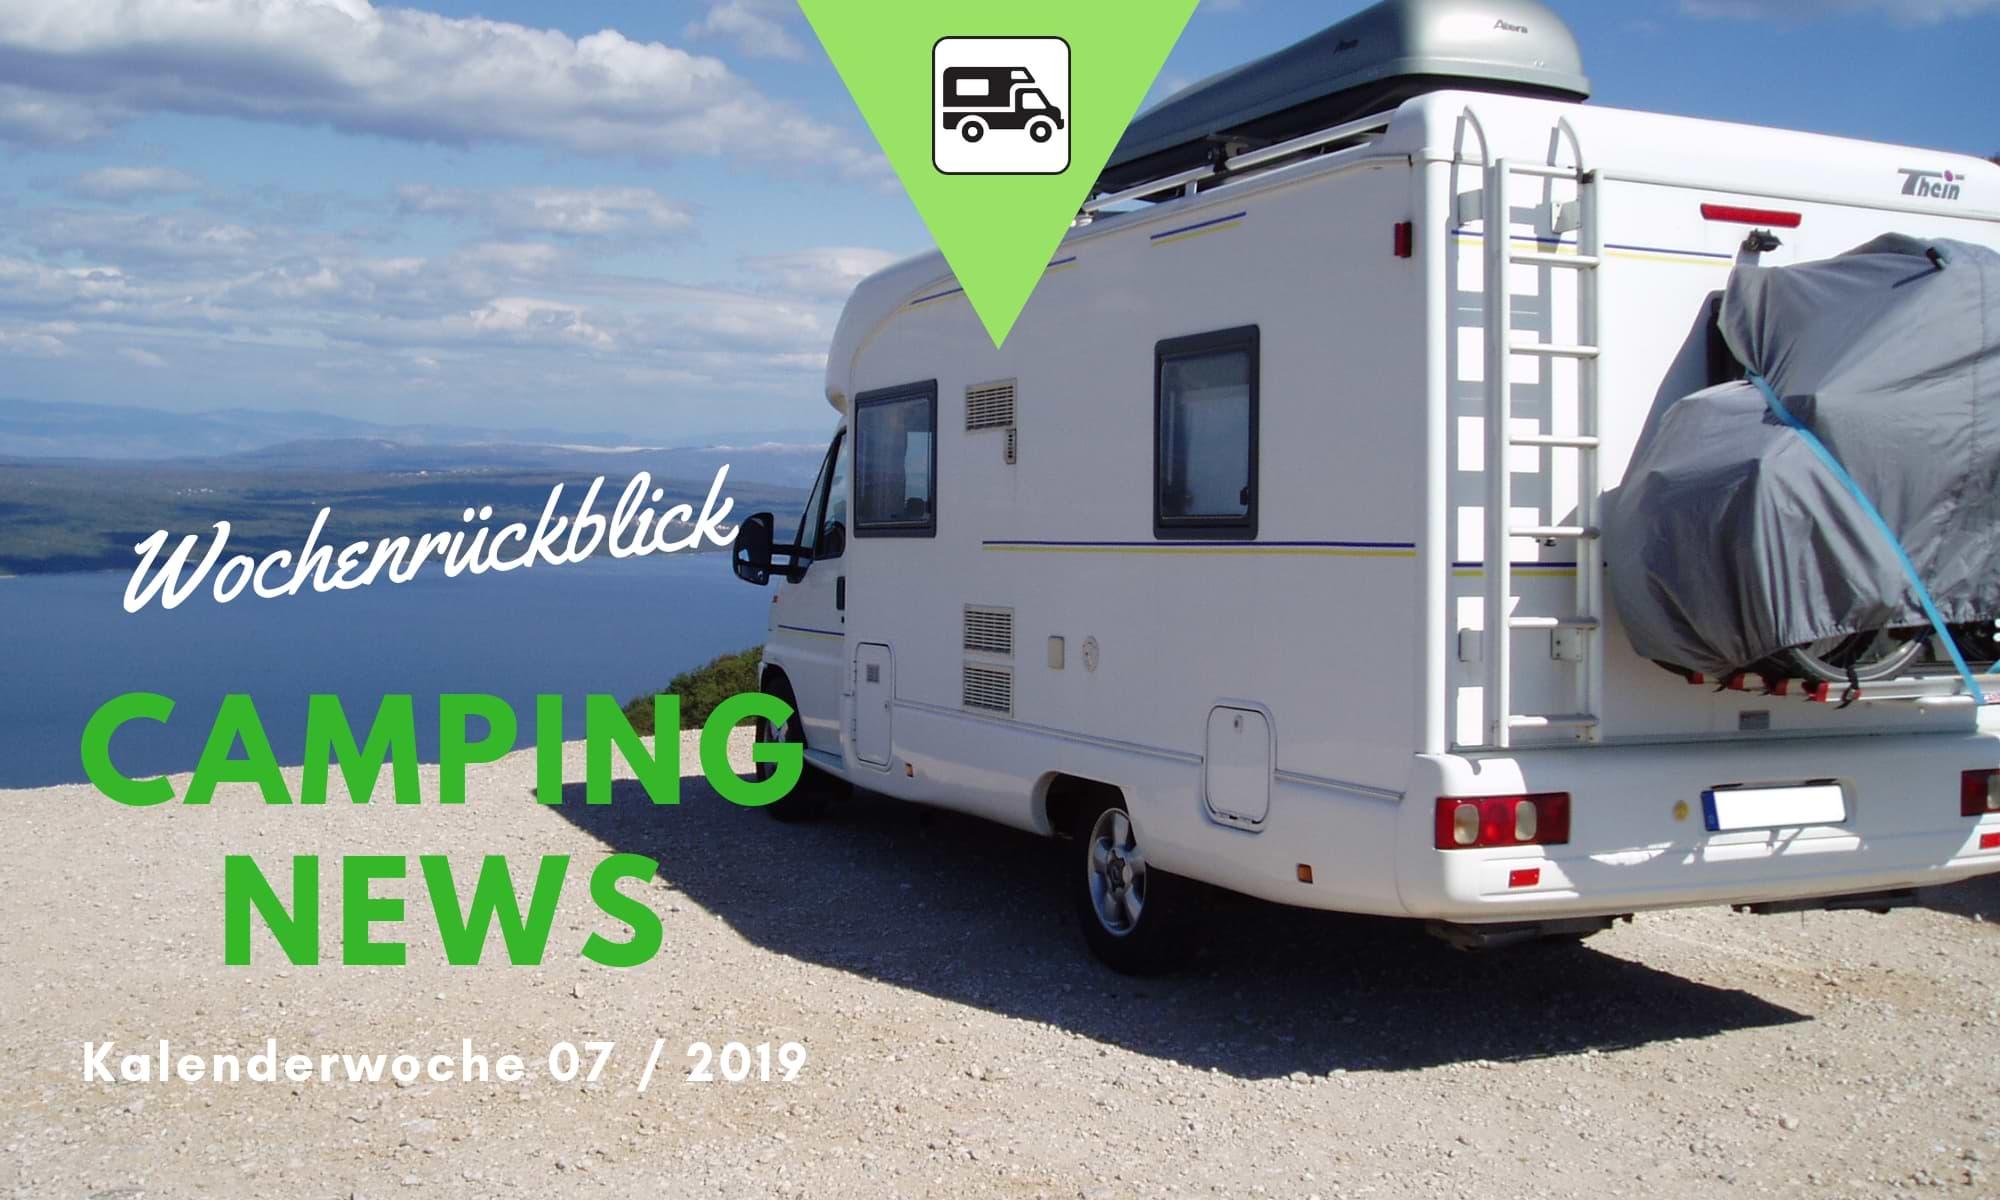 Wochenrückblick Camping News KW07-2019